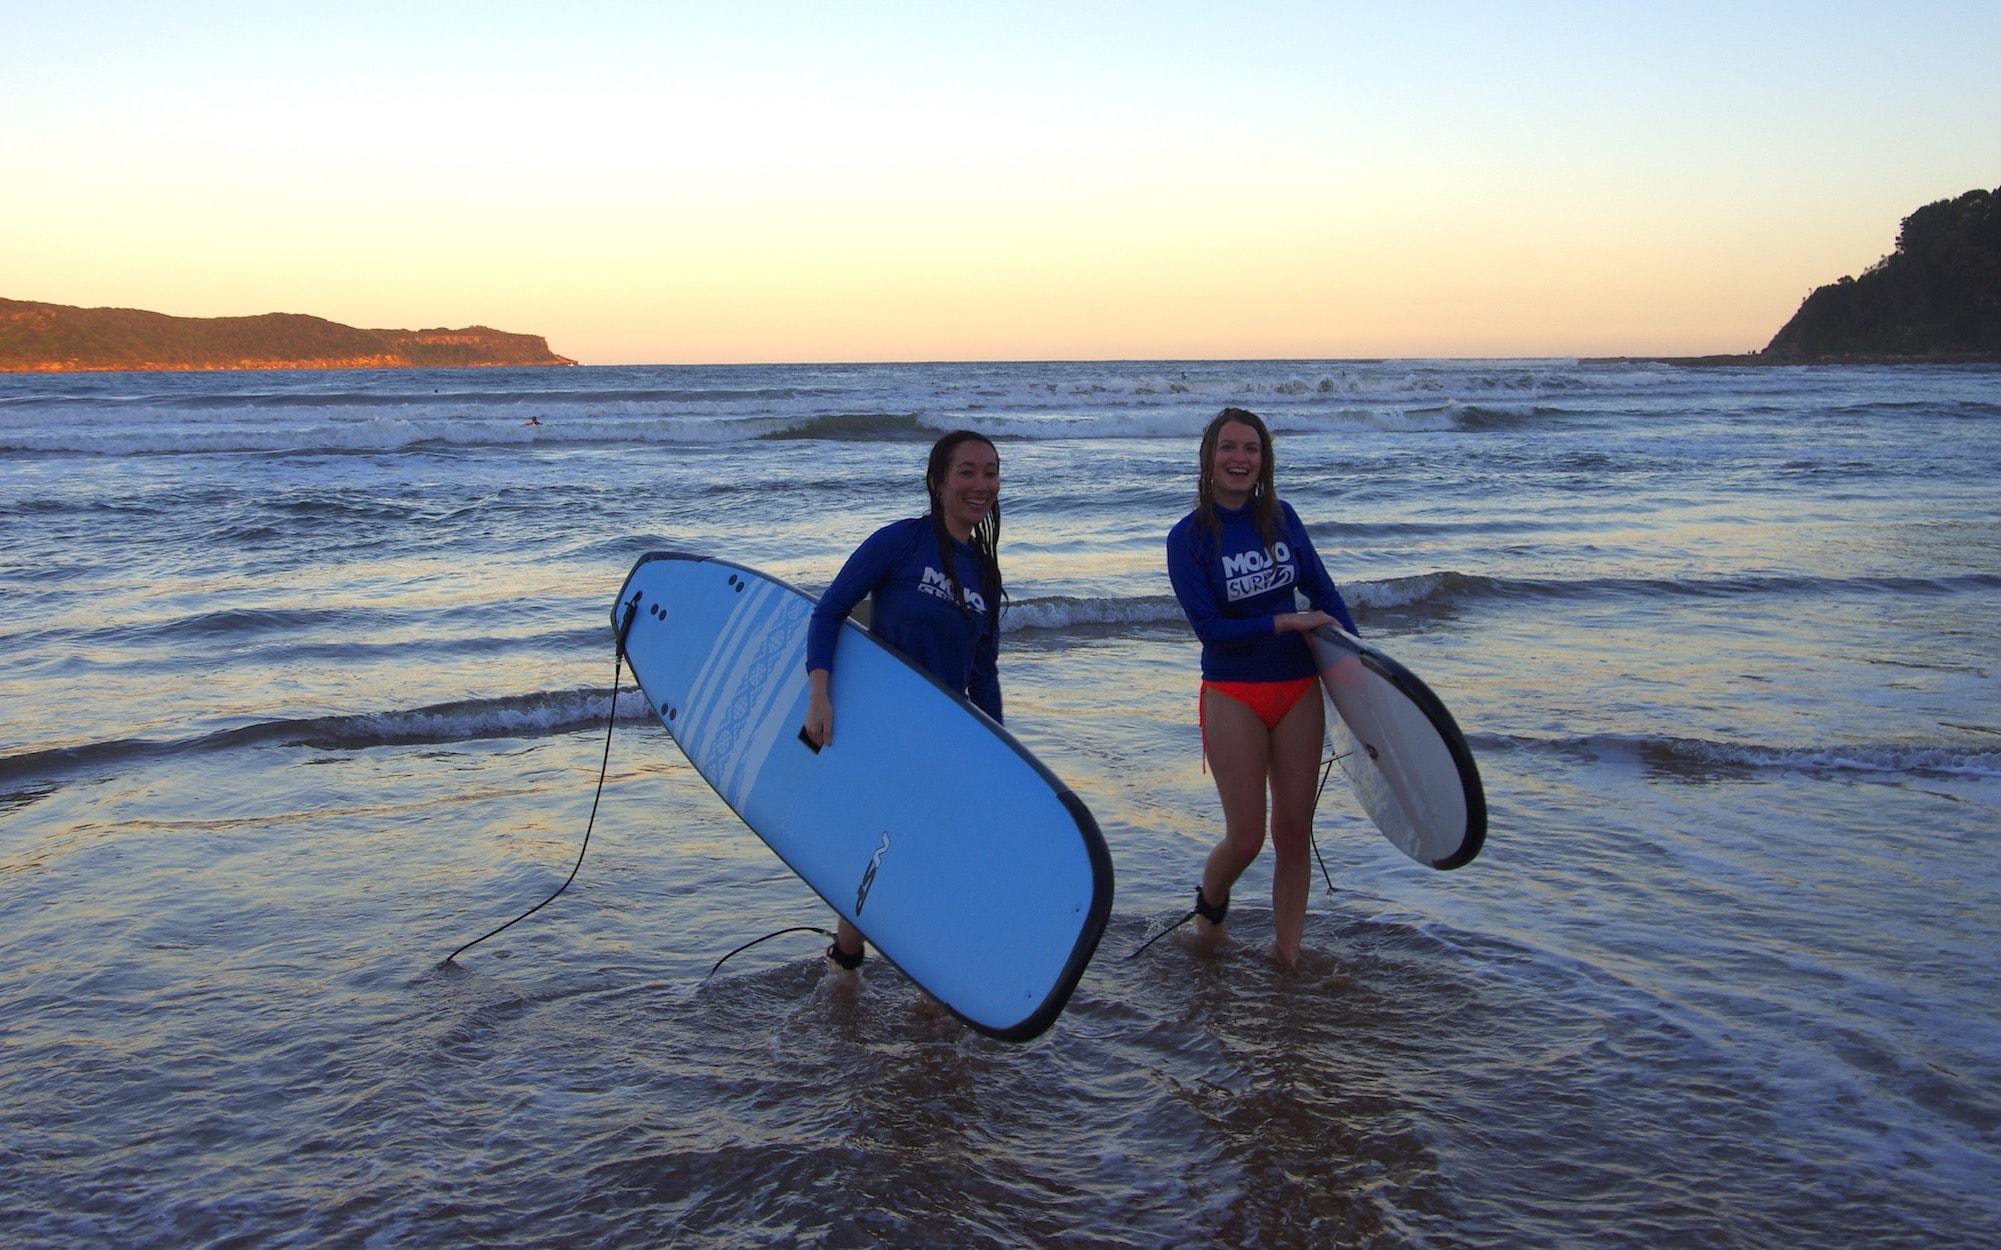 Sydney Surf Camp